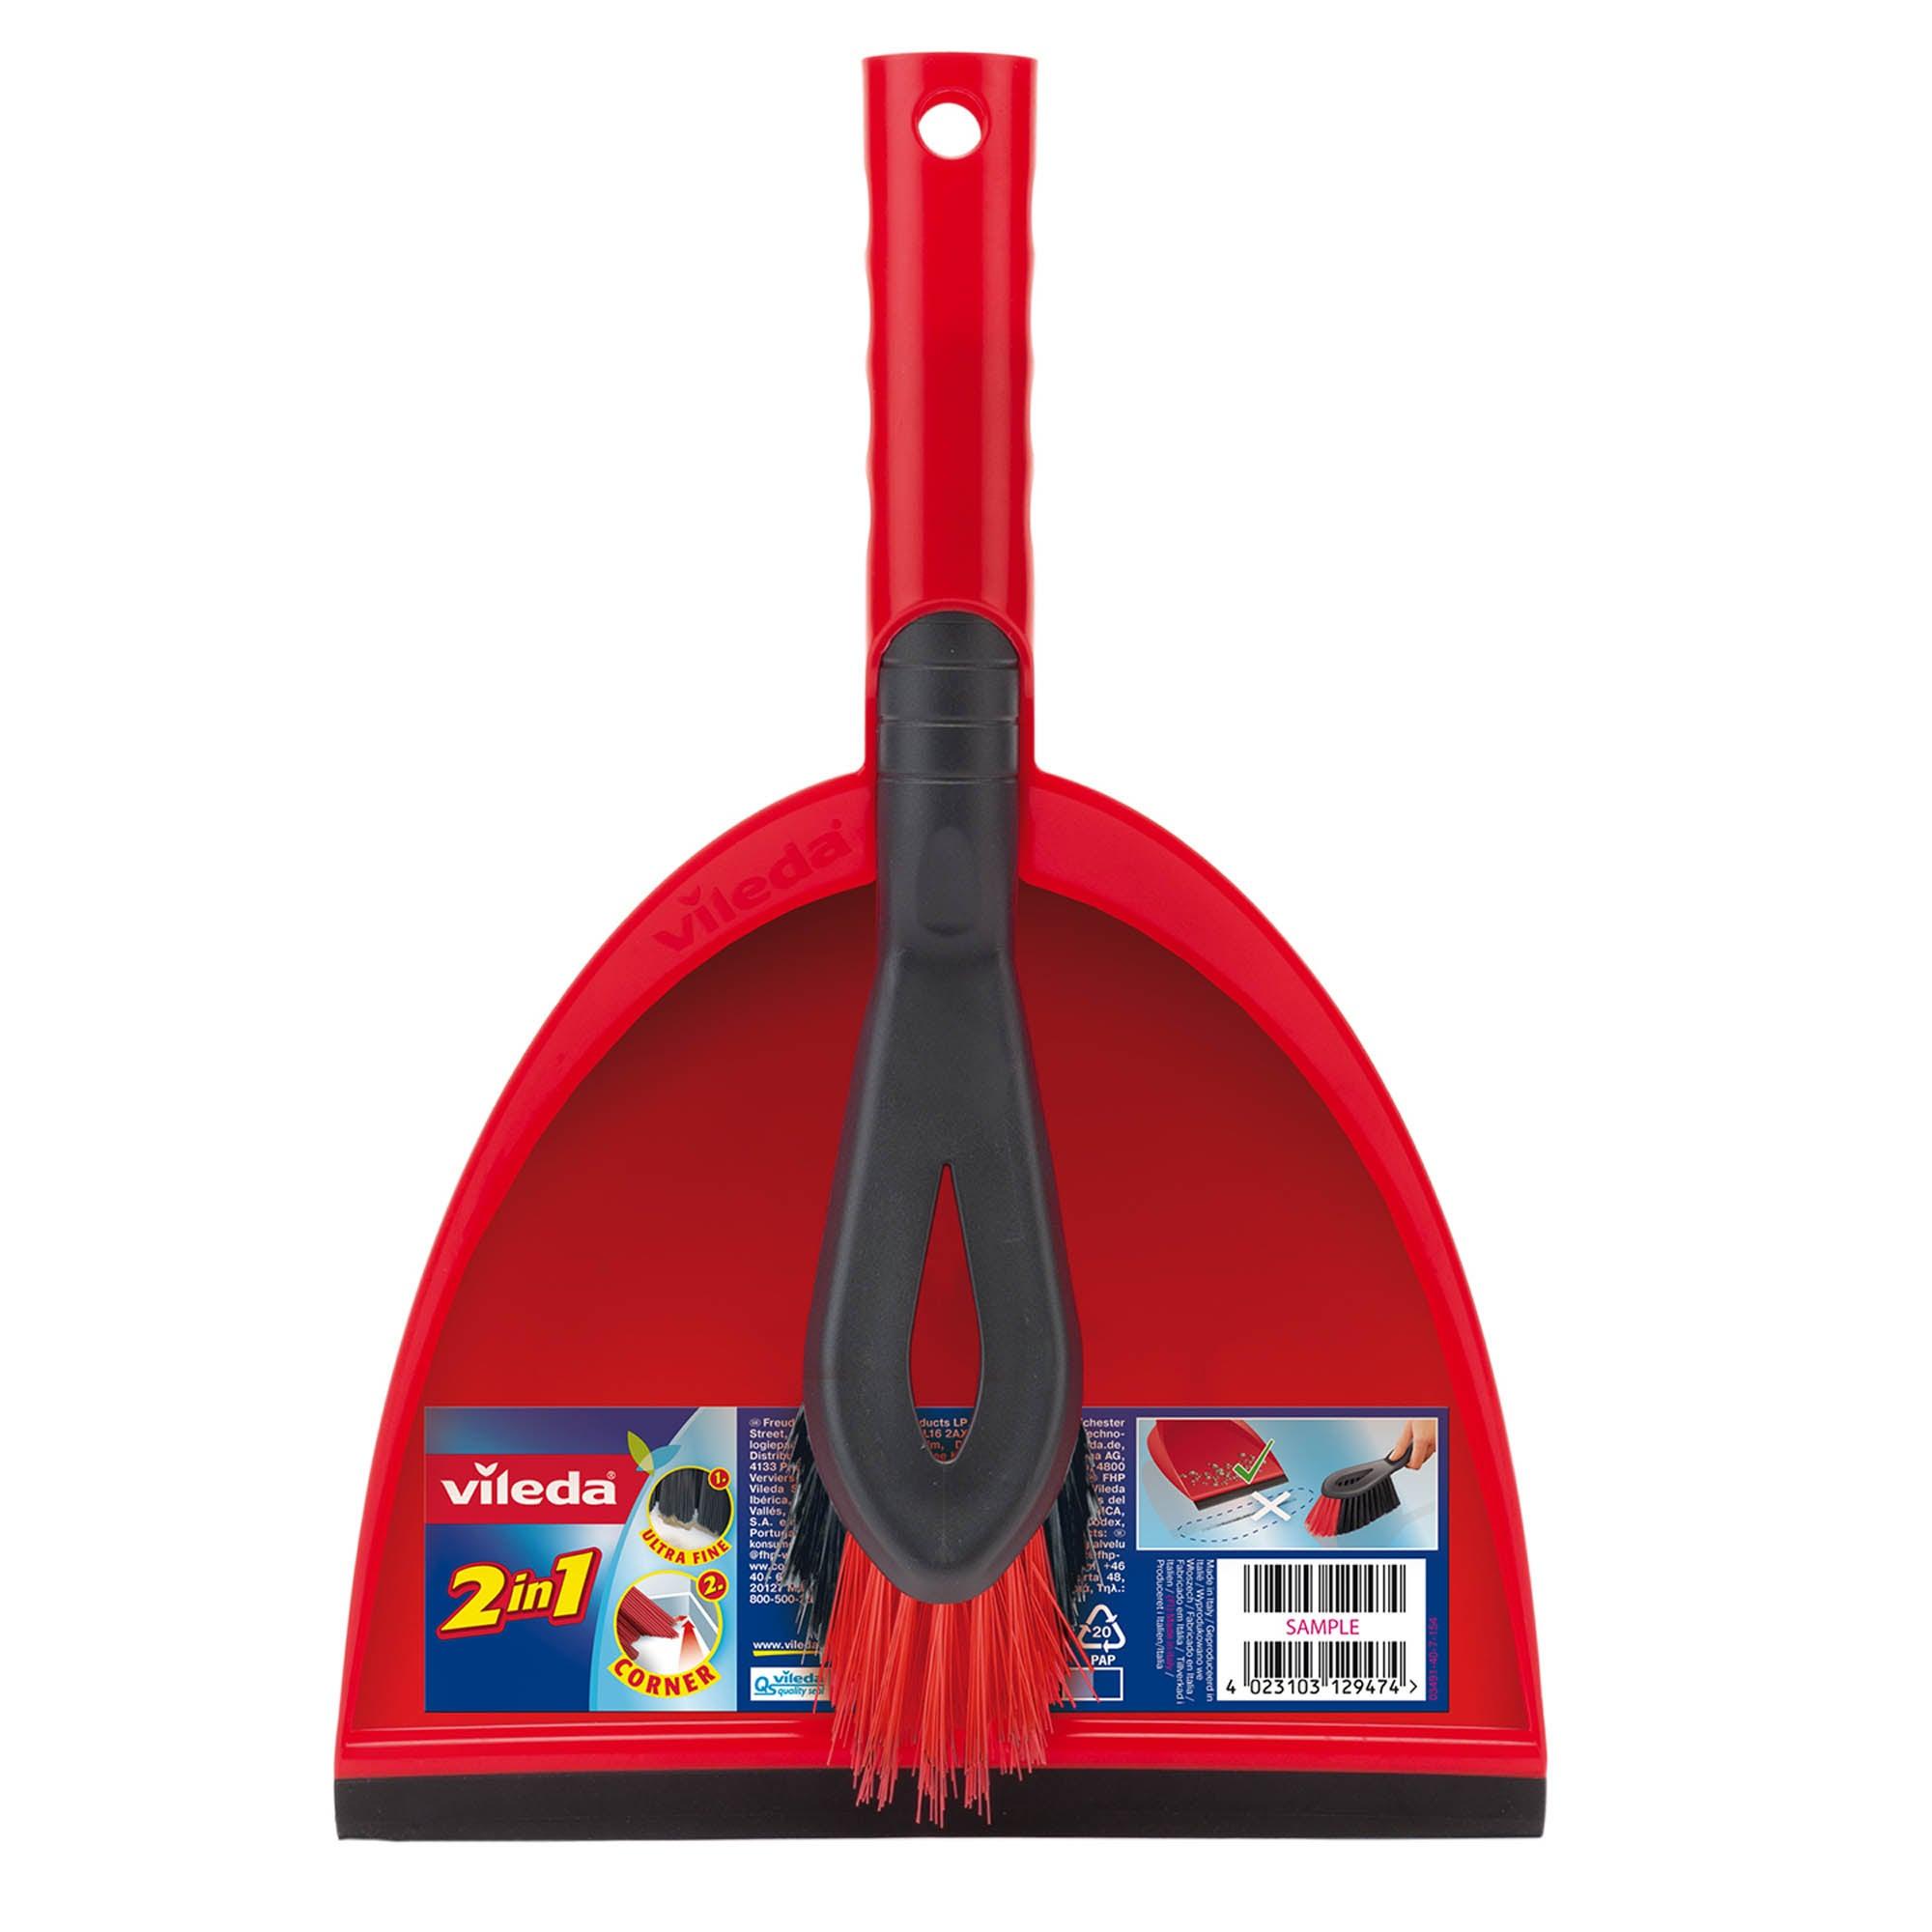 Vileda Dustpan and Brush Set